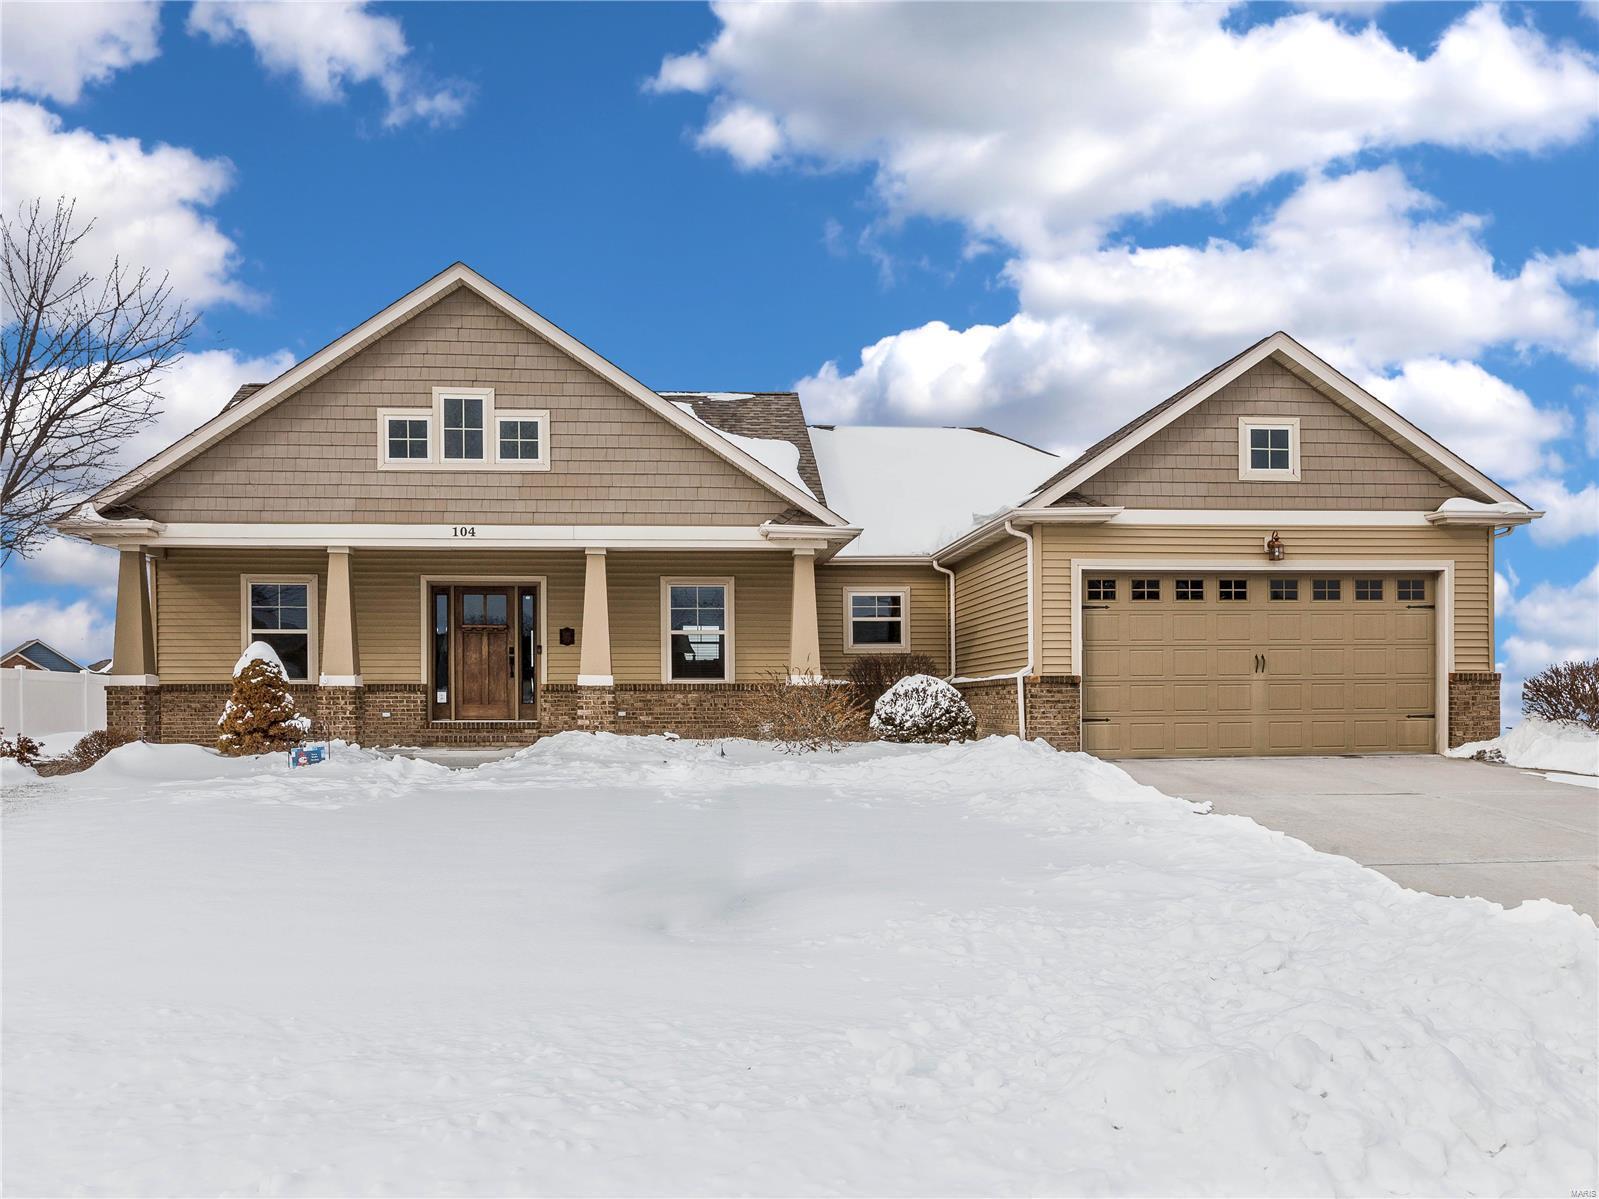 104 Reagan Property Photo - Troy, IL real estate listing